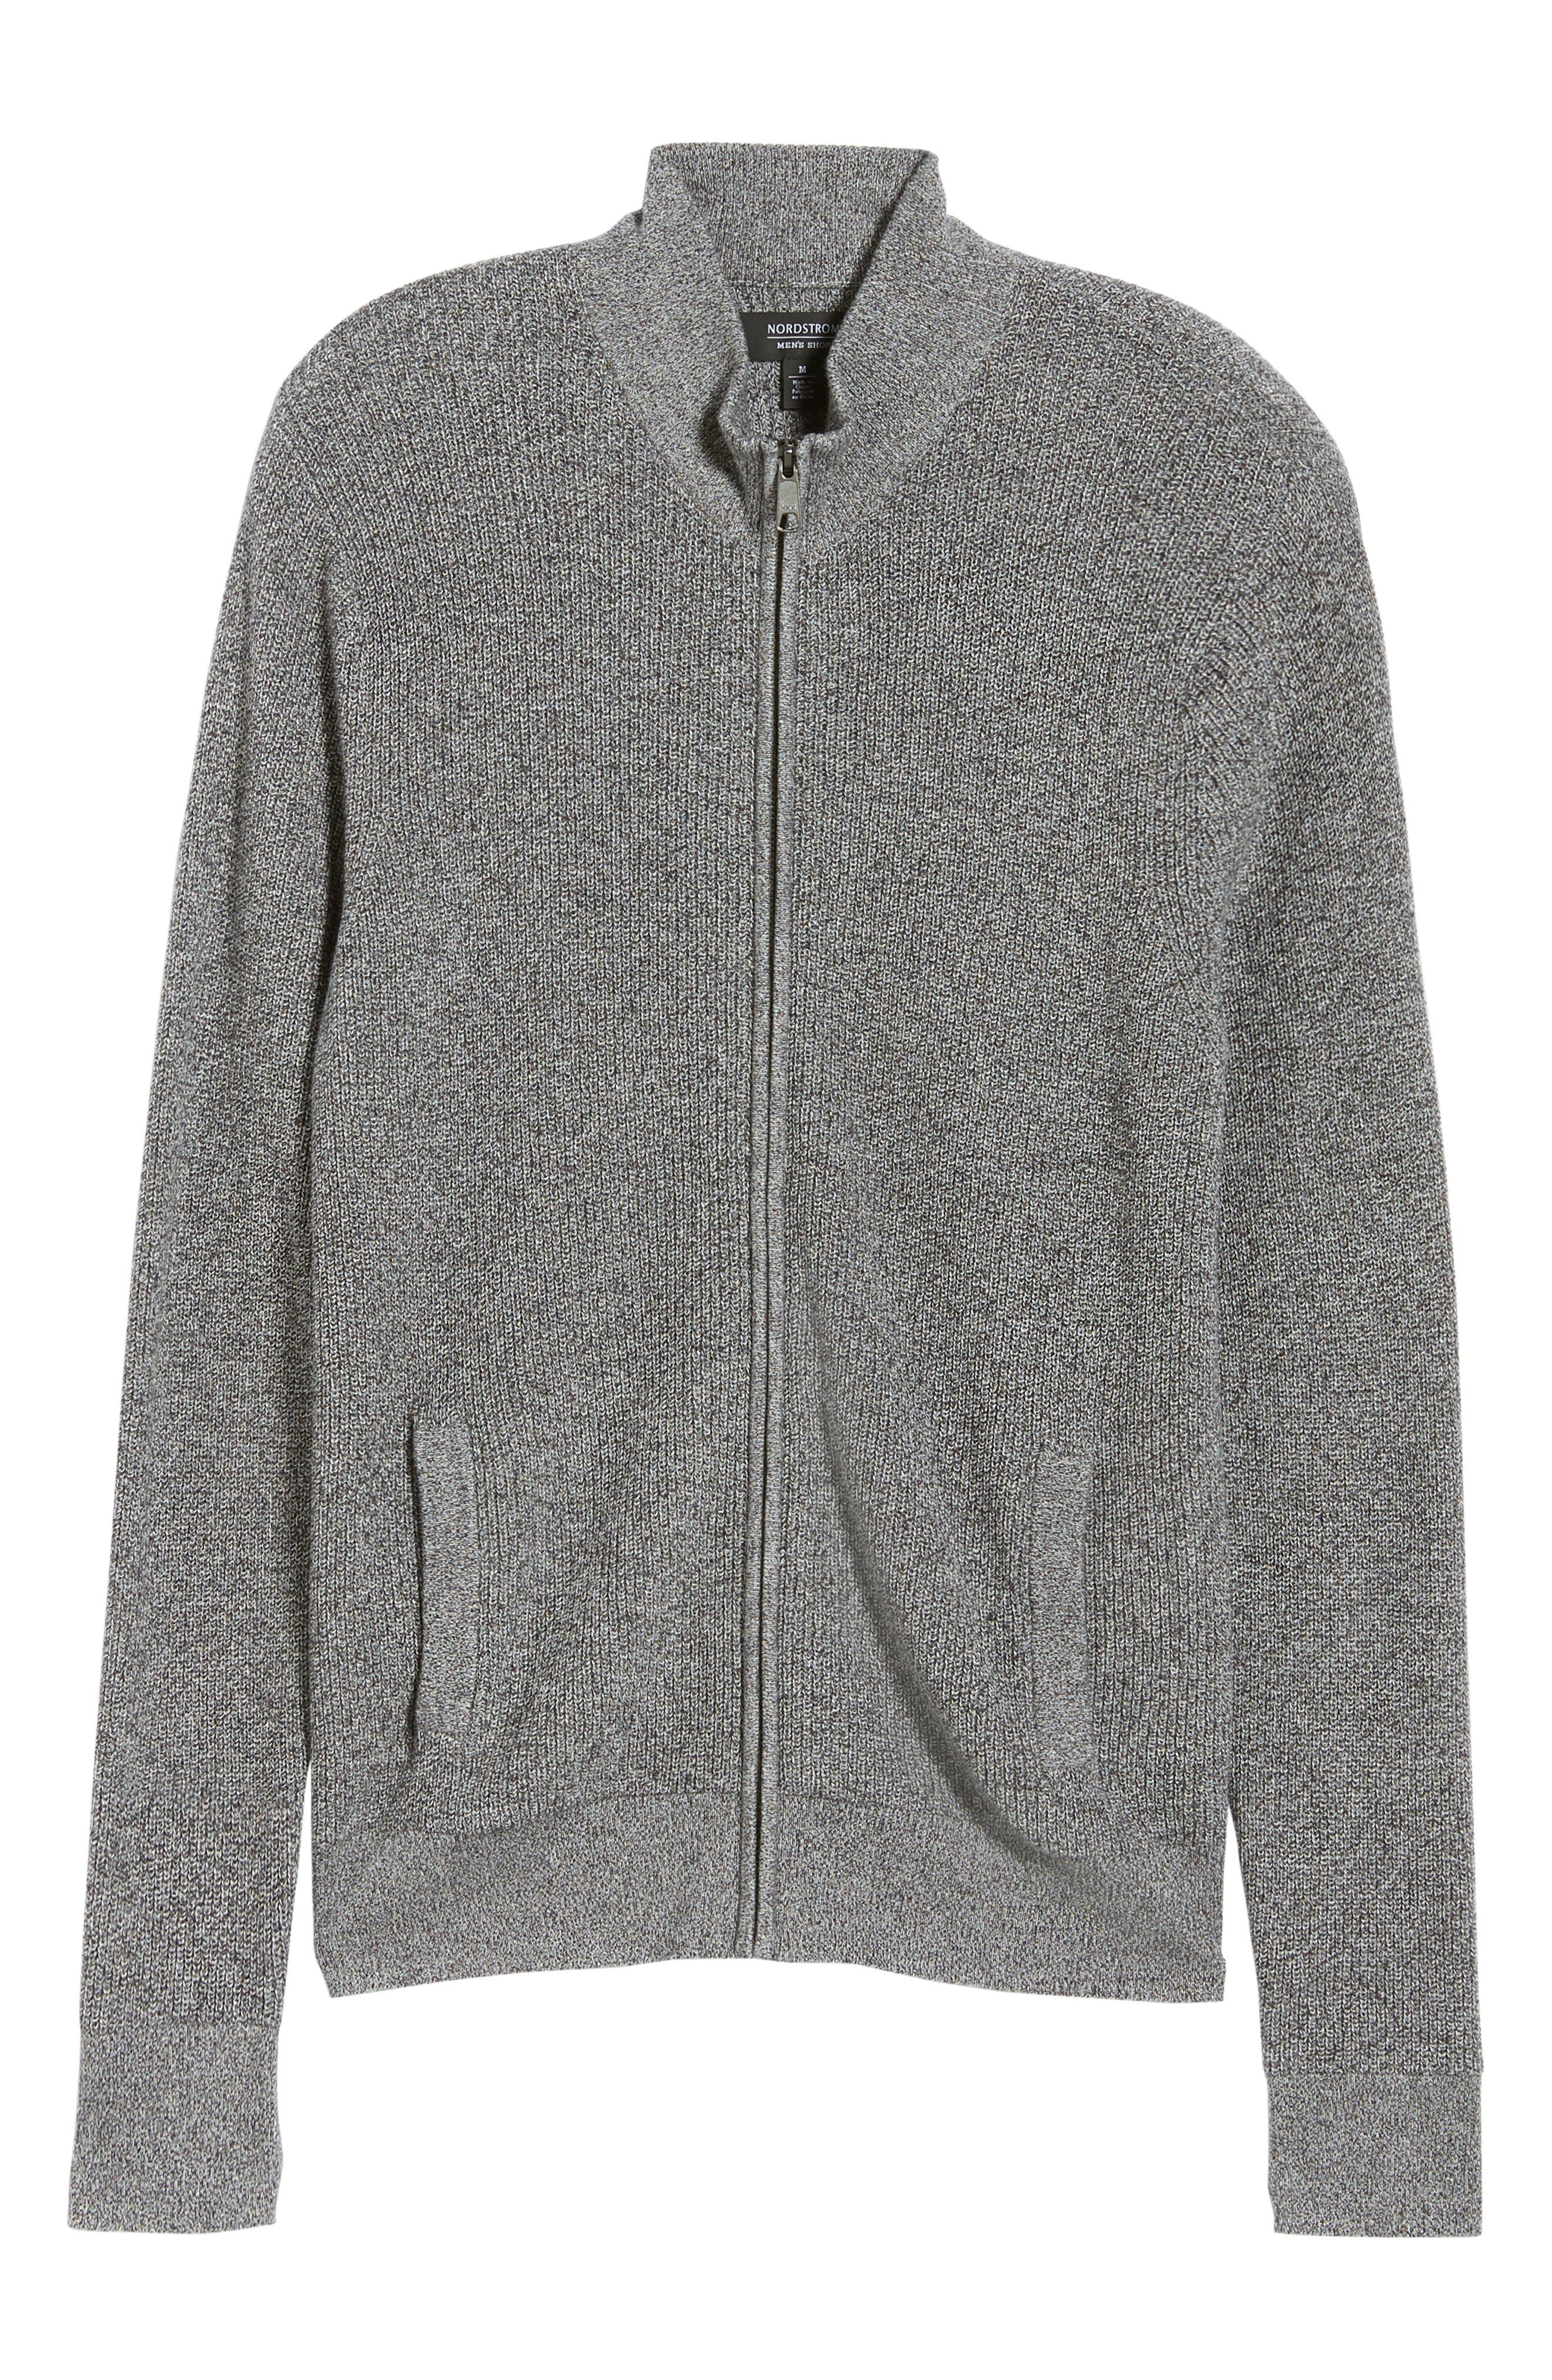 Marled Mock Neck Zip Sweater,                             Alternate thumbnail 6, color,                             BLACK IVORY MARL